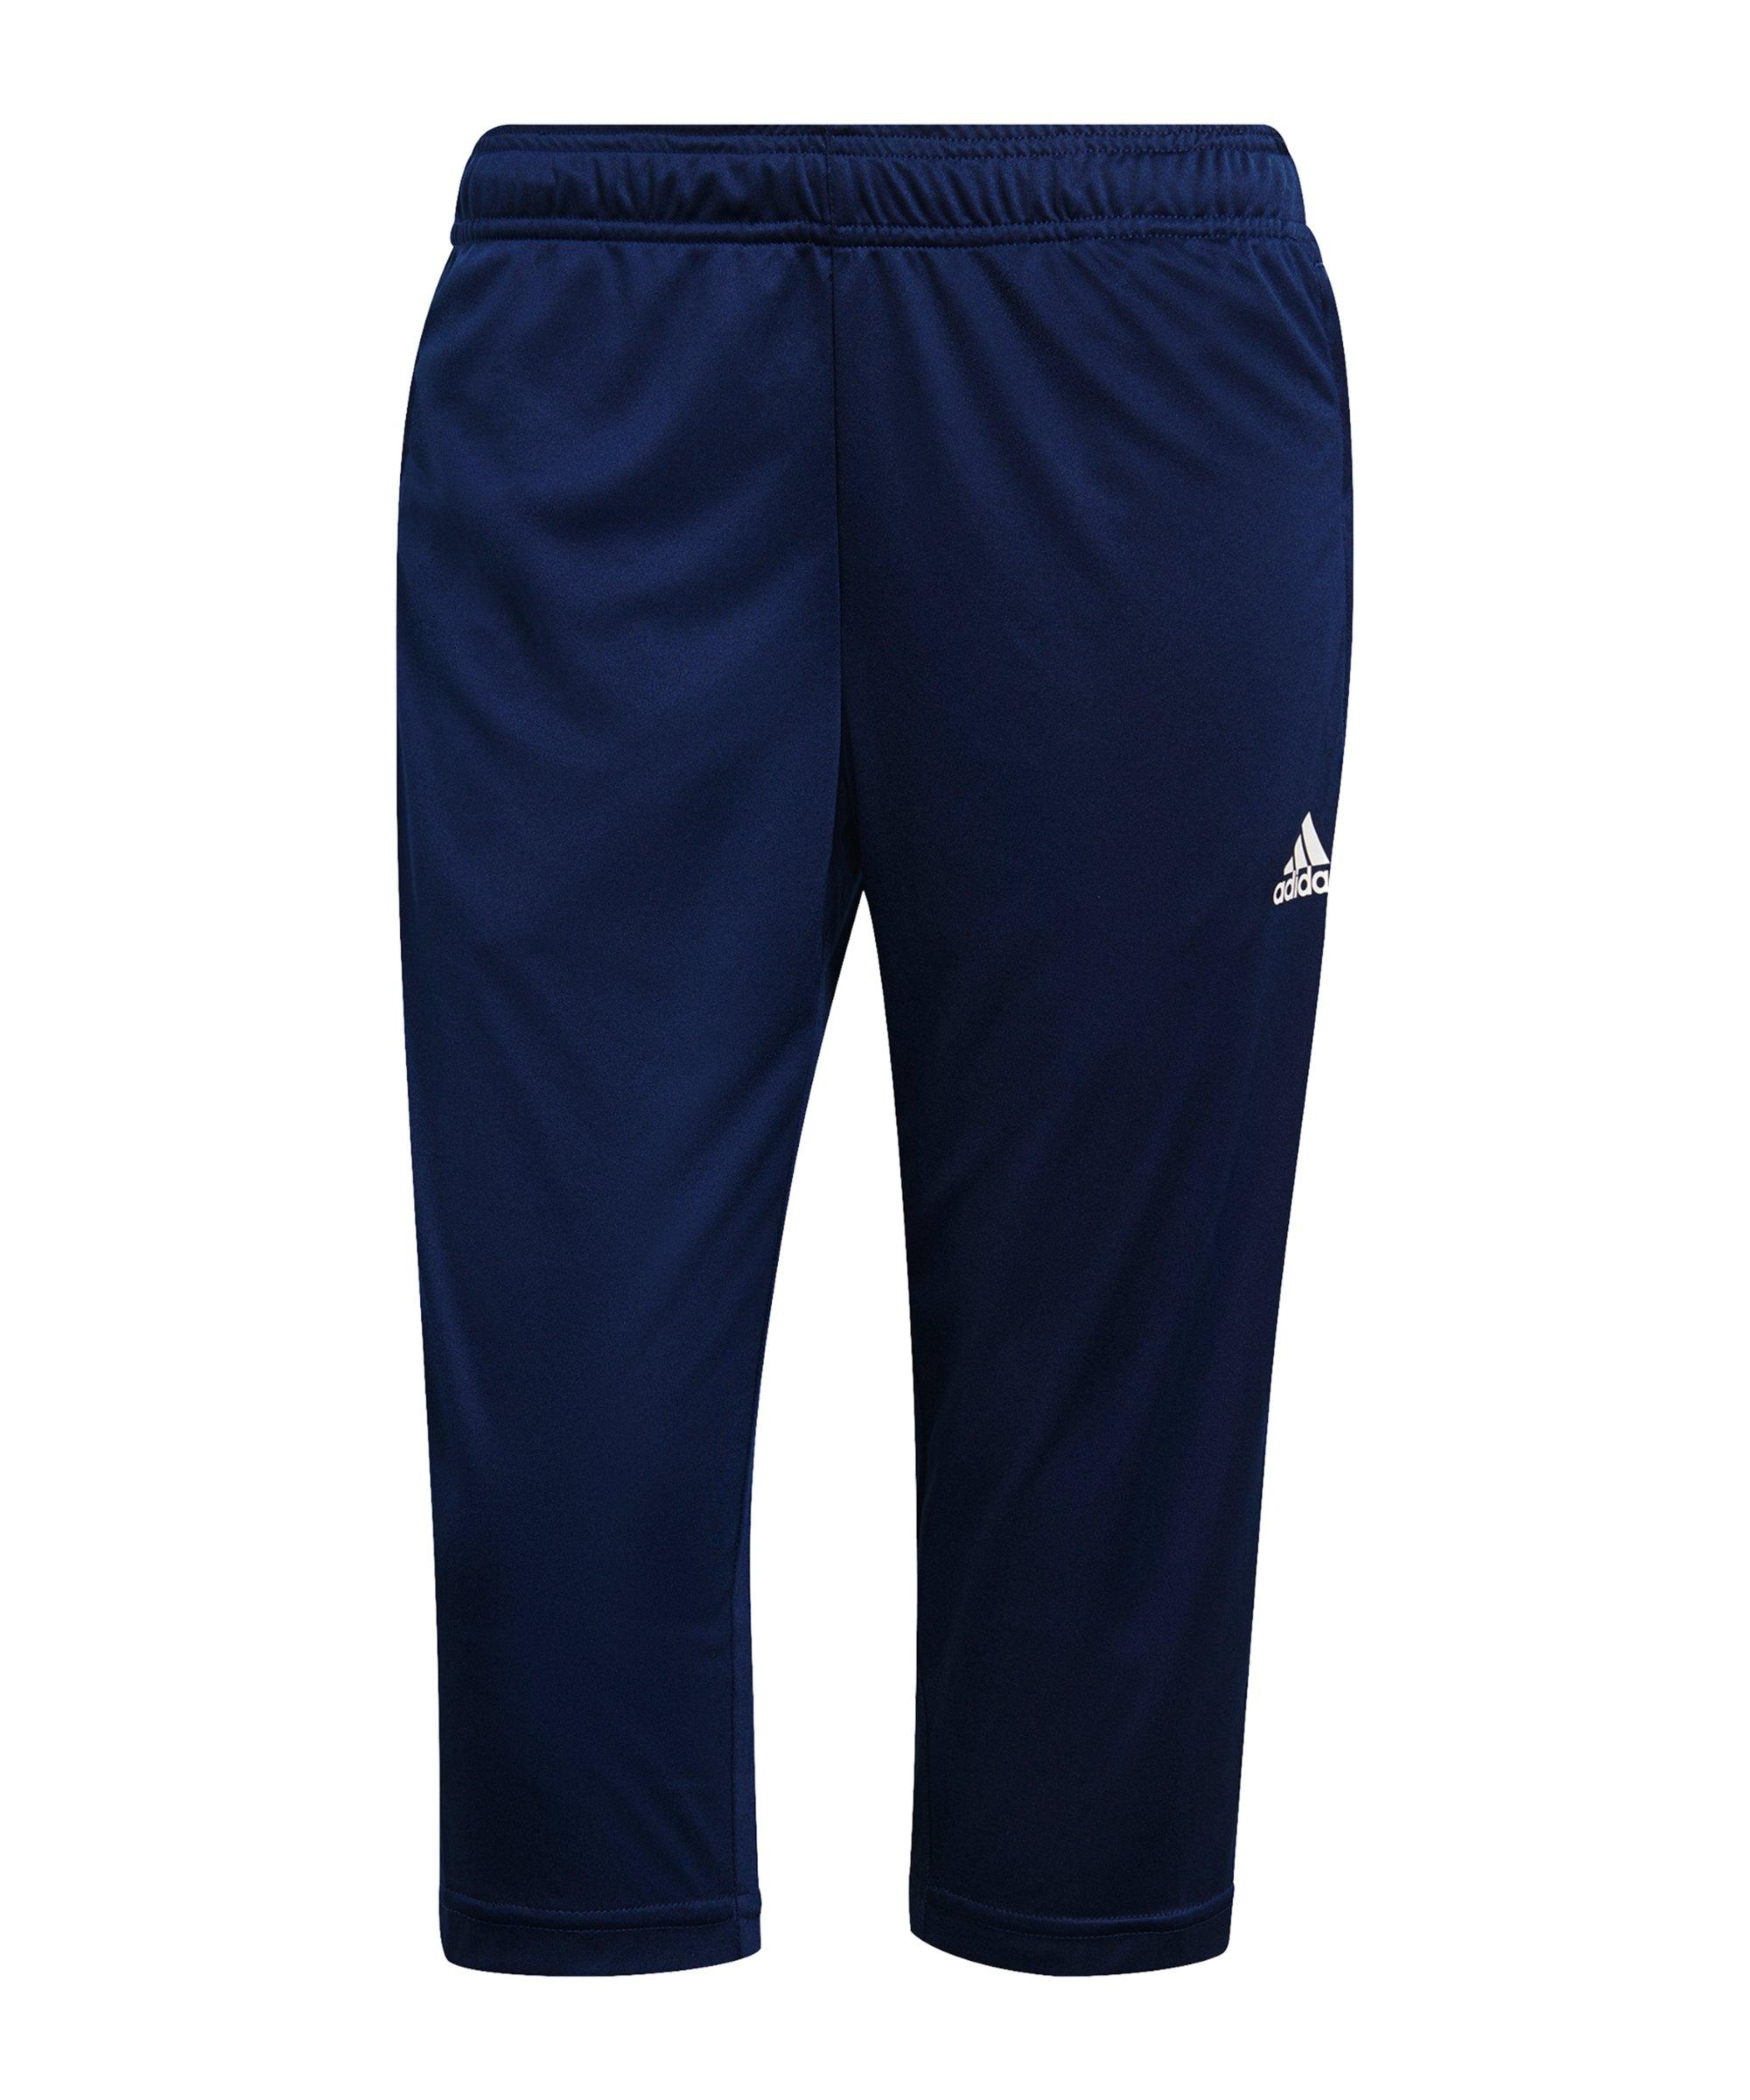 adidas Tiro 21 3/4 Trainingshose Damen Dunkelblau - blau